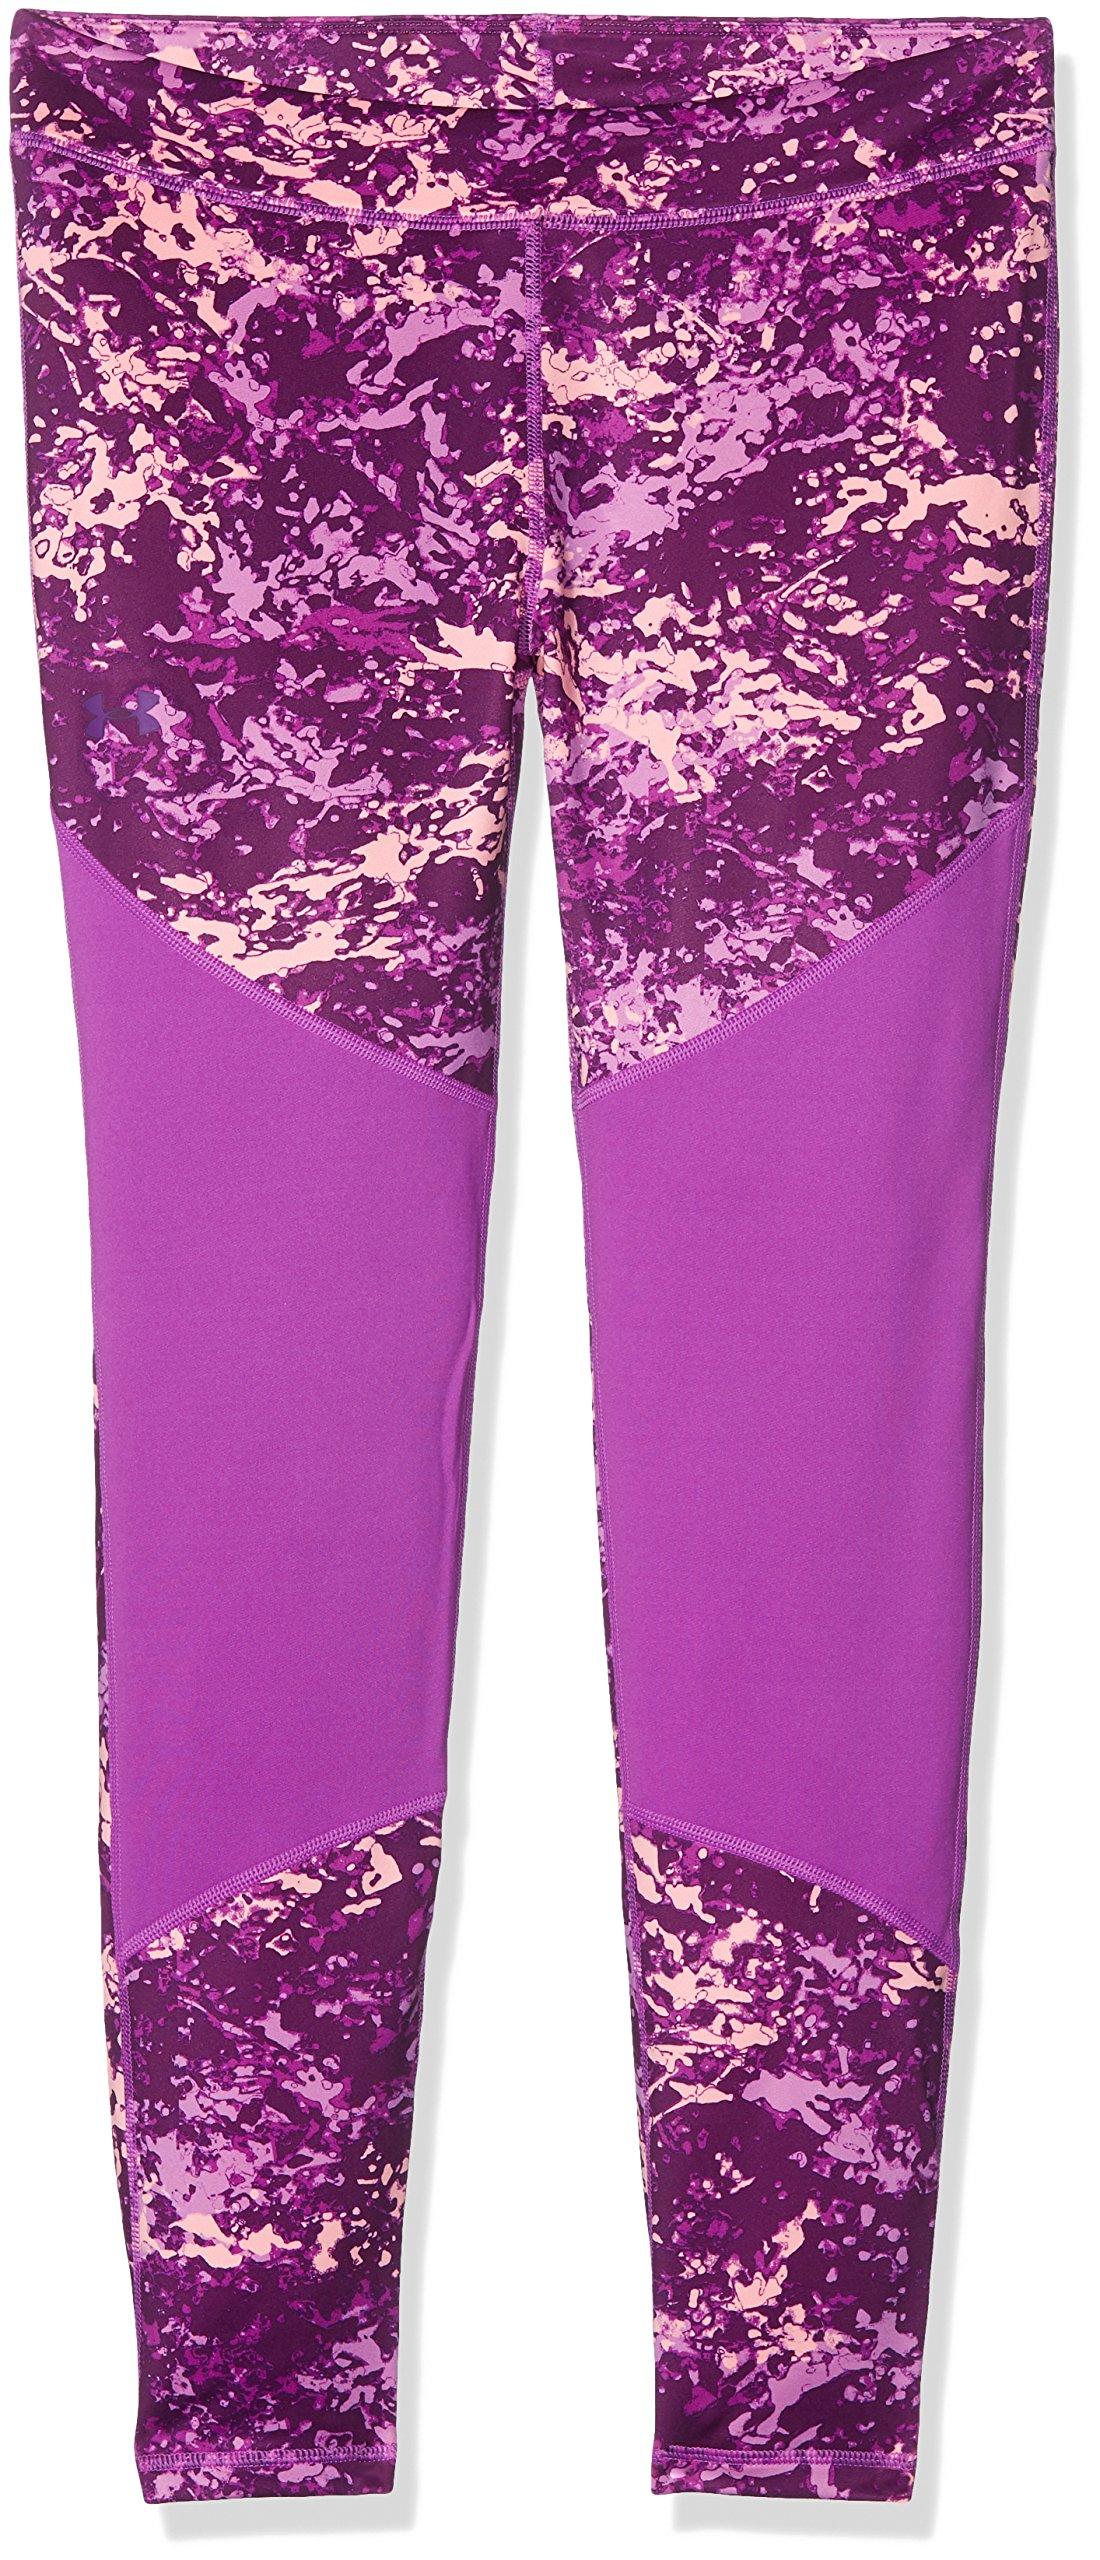 Under Armour Girls' ColdGear Novelty Leggings,Purple Rave (959)/Indulge, Youth X-Large